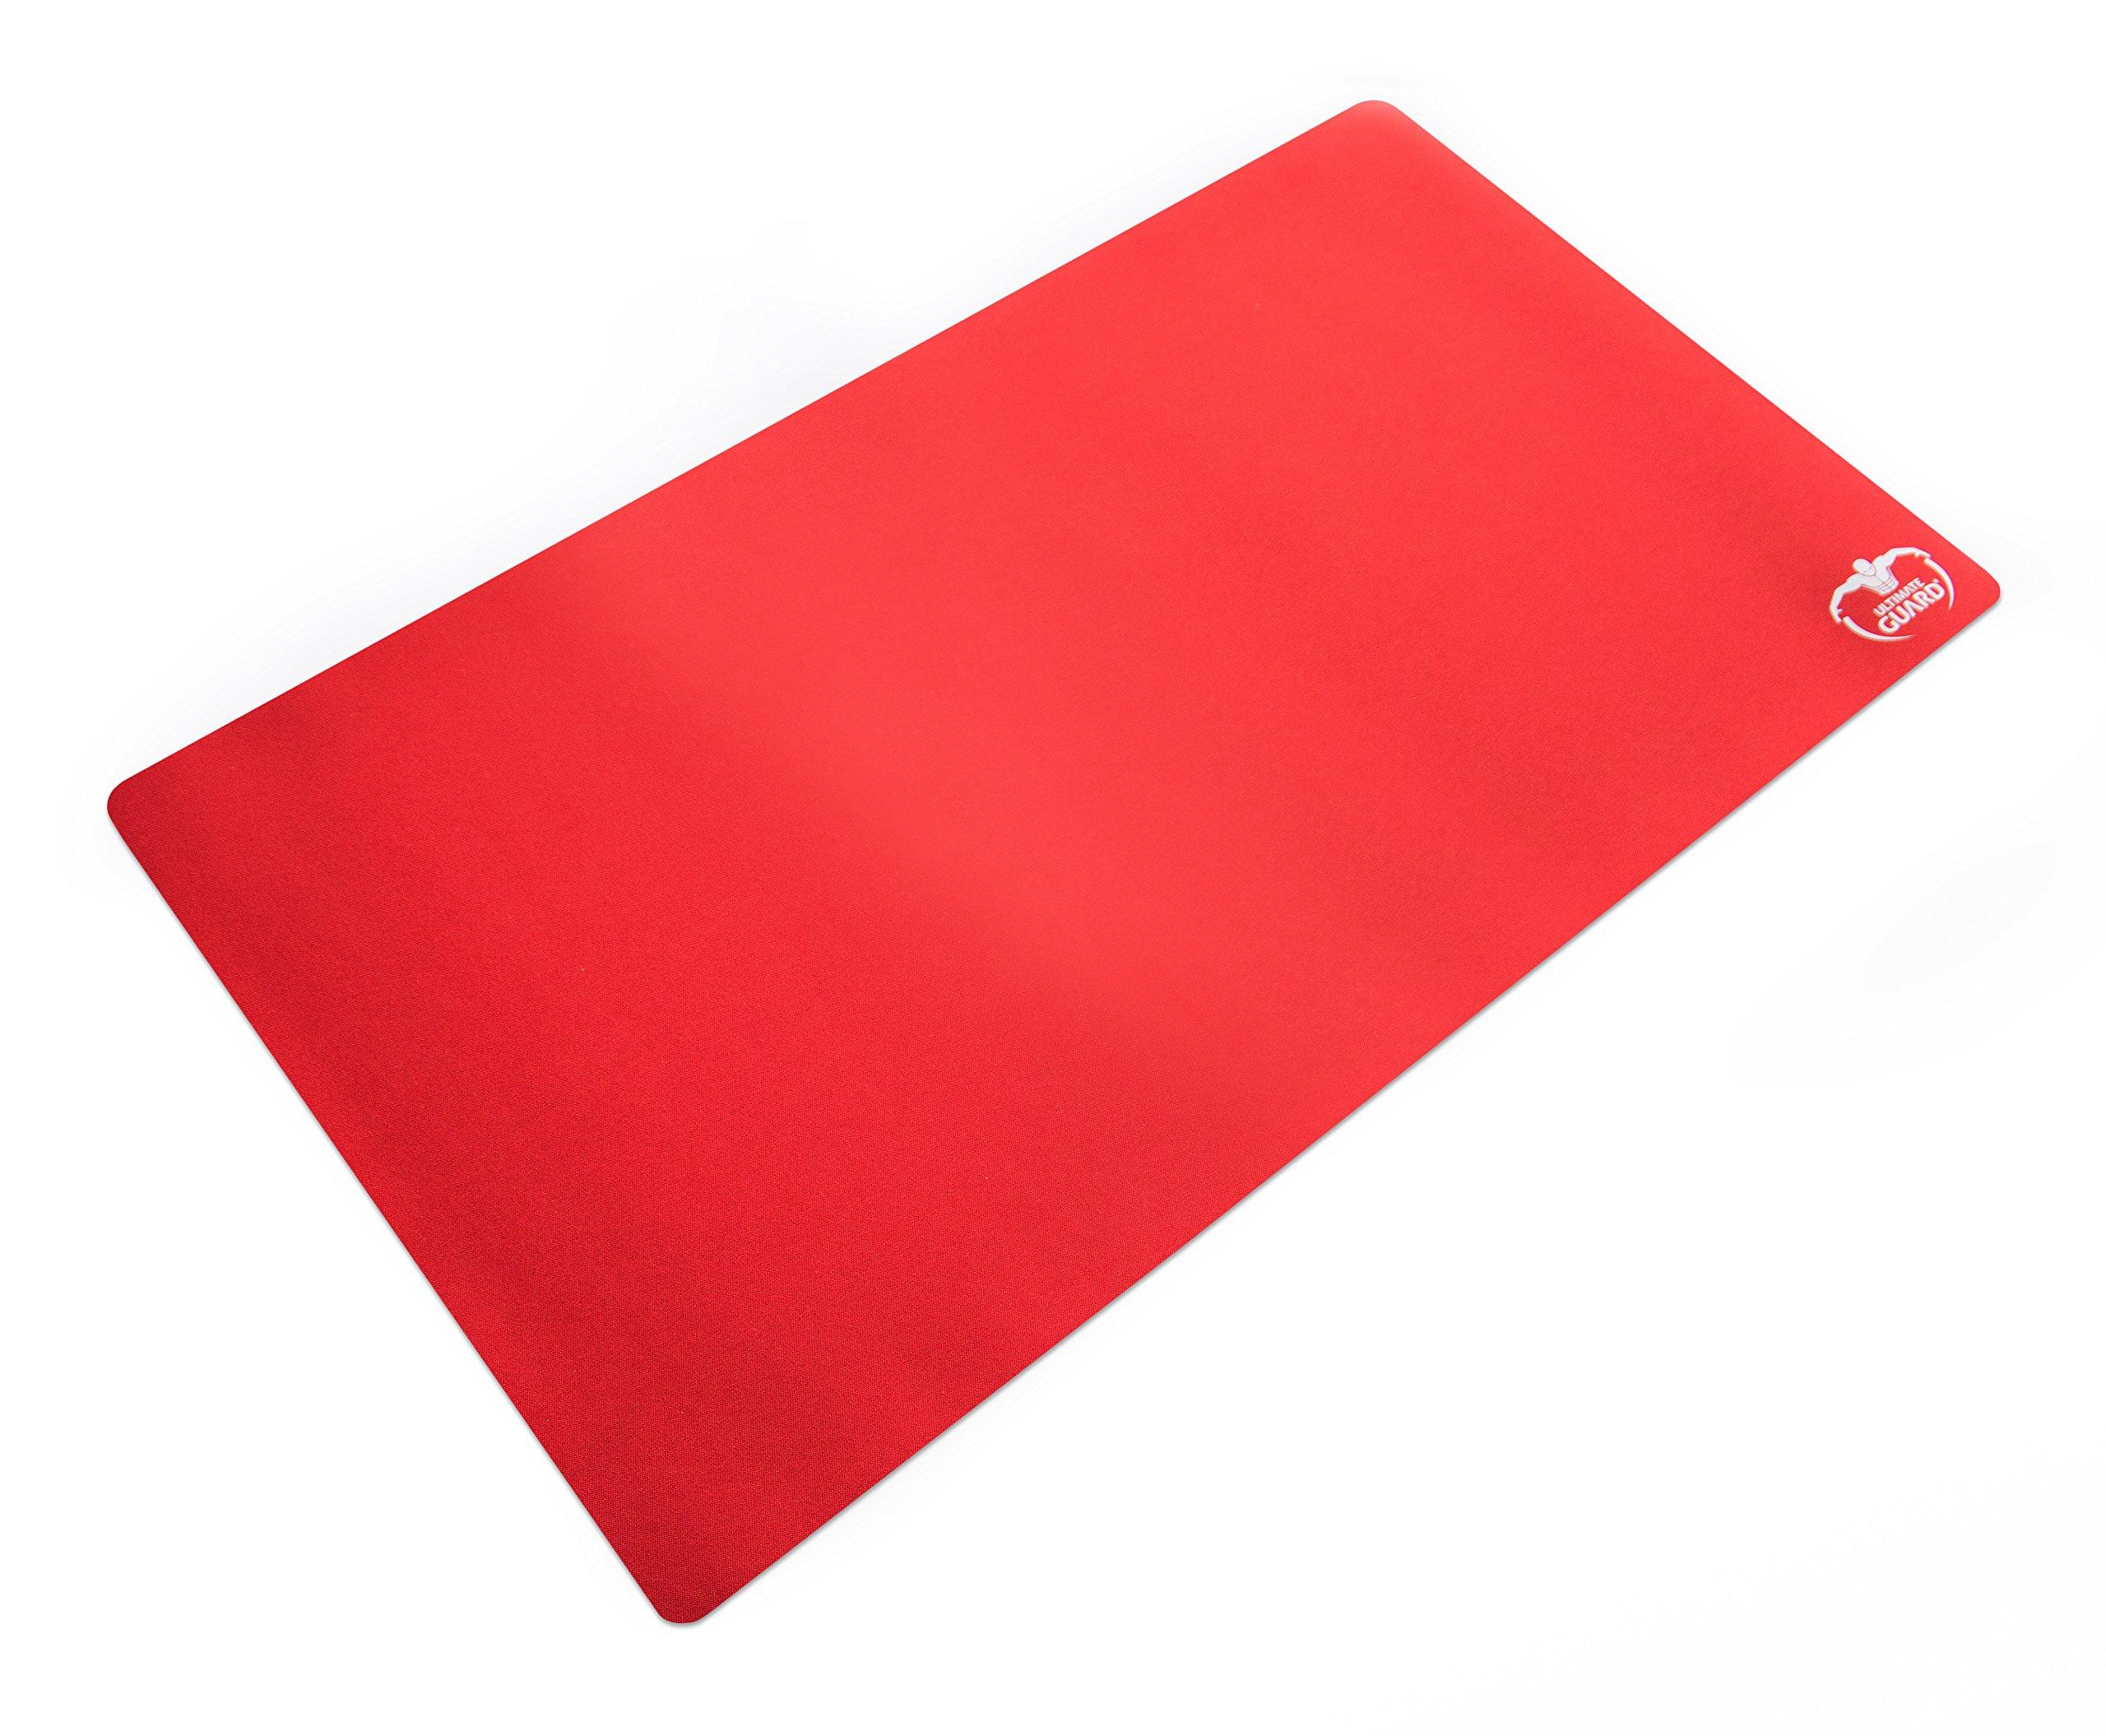 Ultimate-Guard-UGD010196-Spielmatte-Monochrome-61-x-35-cm-rot